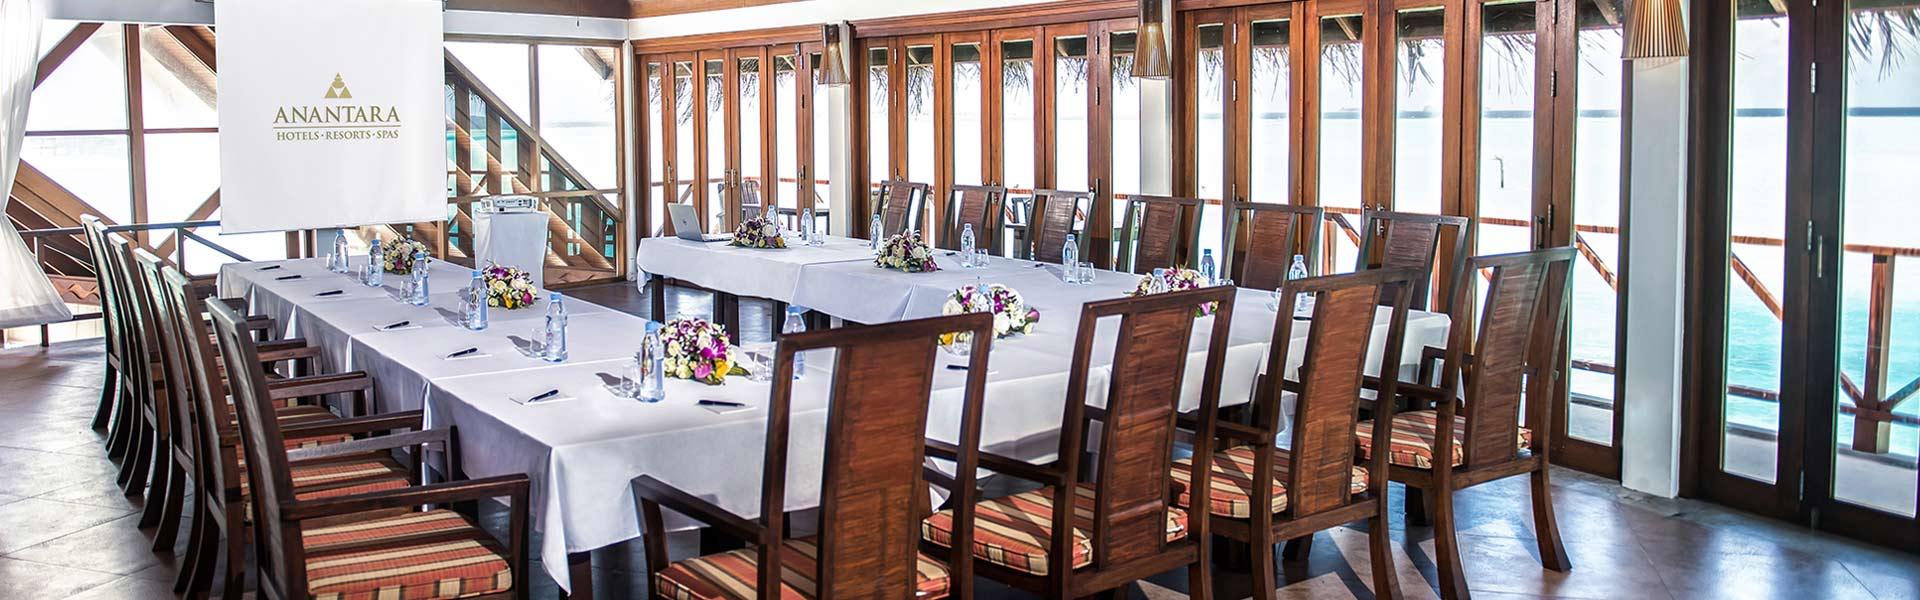 Meeting Rooms at Anantara Dhigu Family Resort